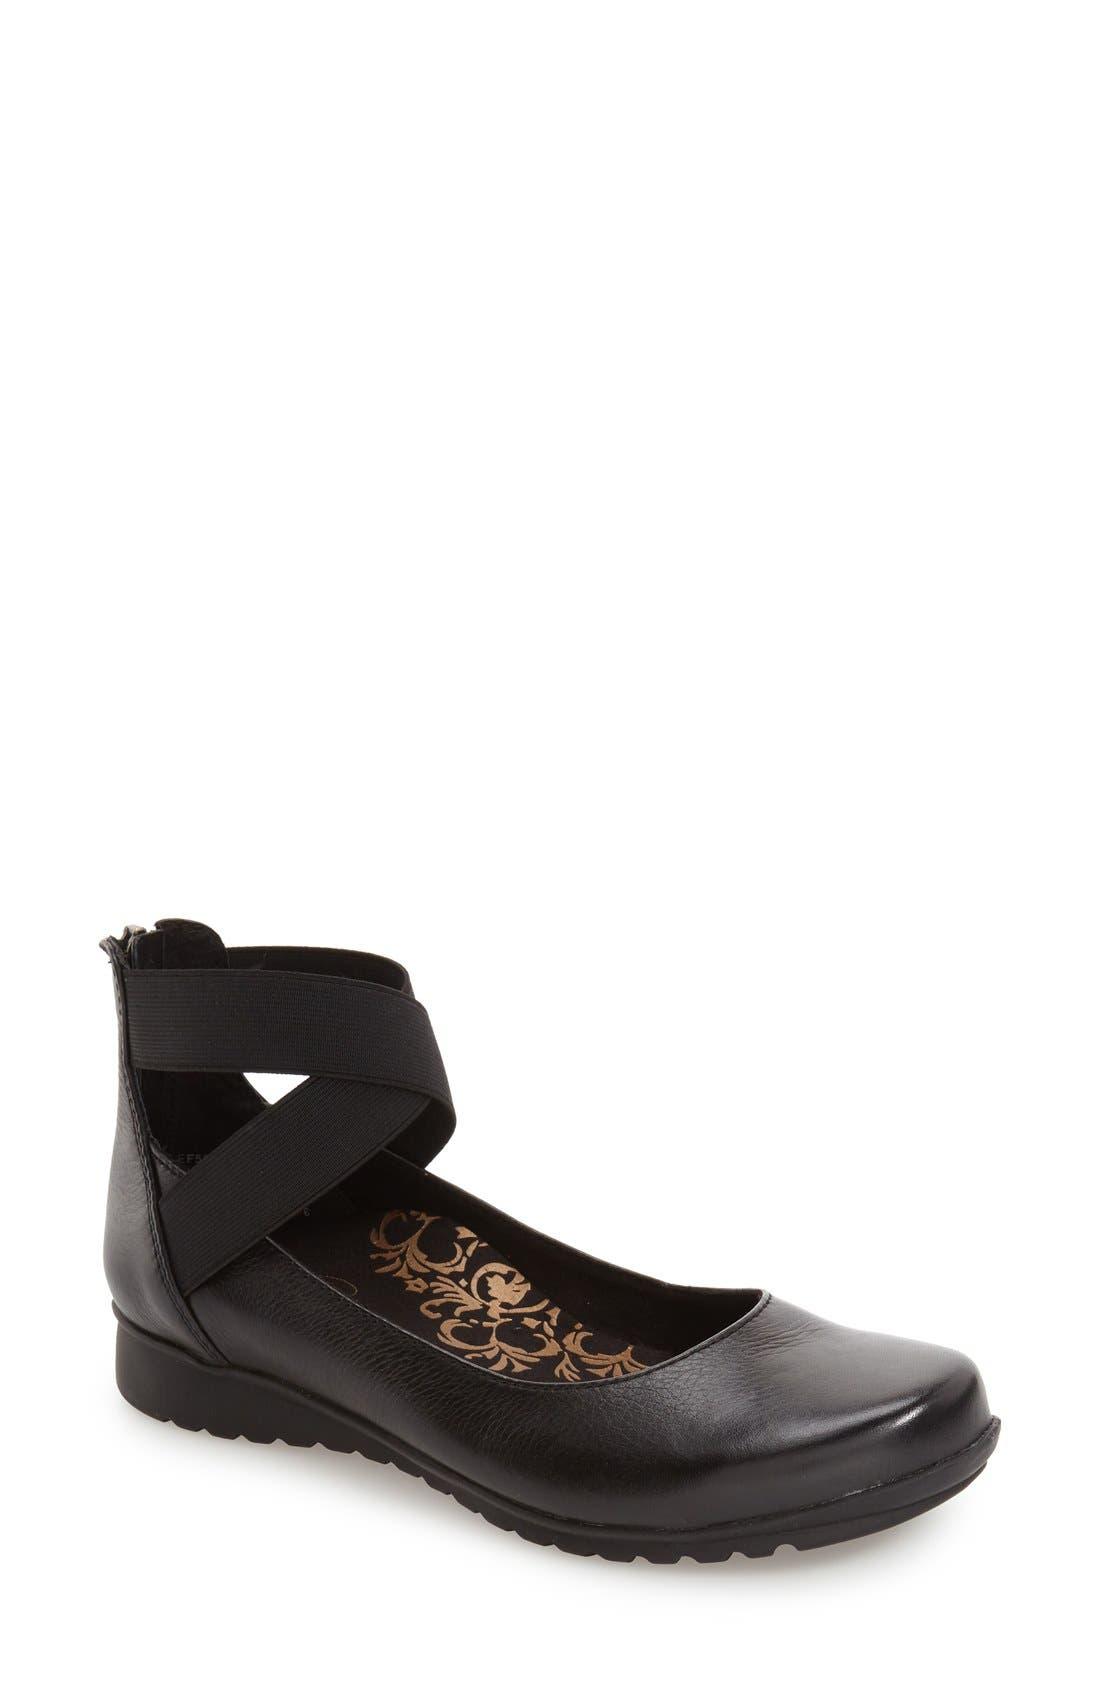 AETREX 'Dakota' Ankle Strap Ballet Flat, Main, color, BLACK LEATHER